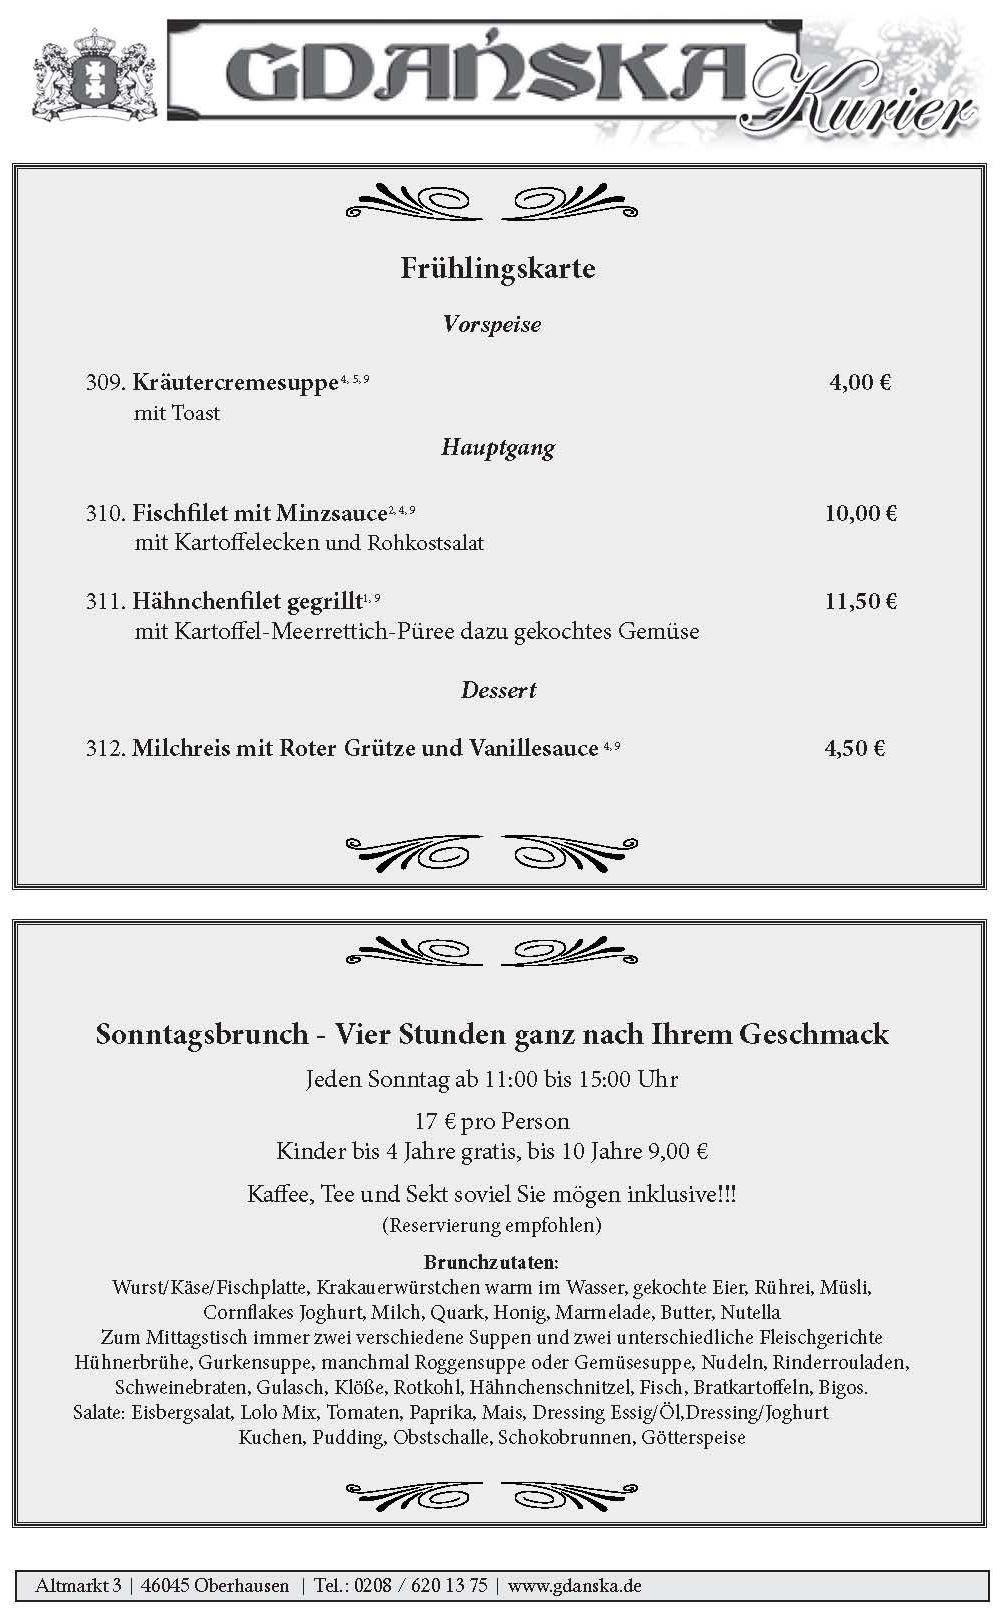 gdanksa_Speisekarte_Frühlingskarte_2016